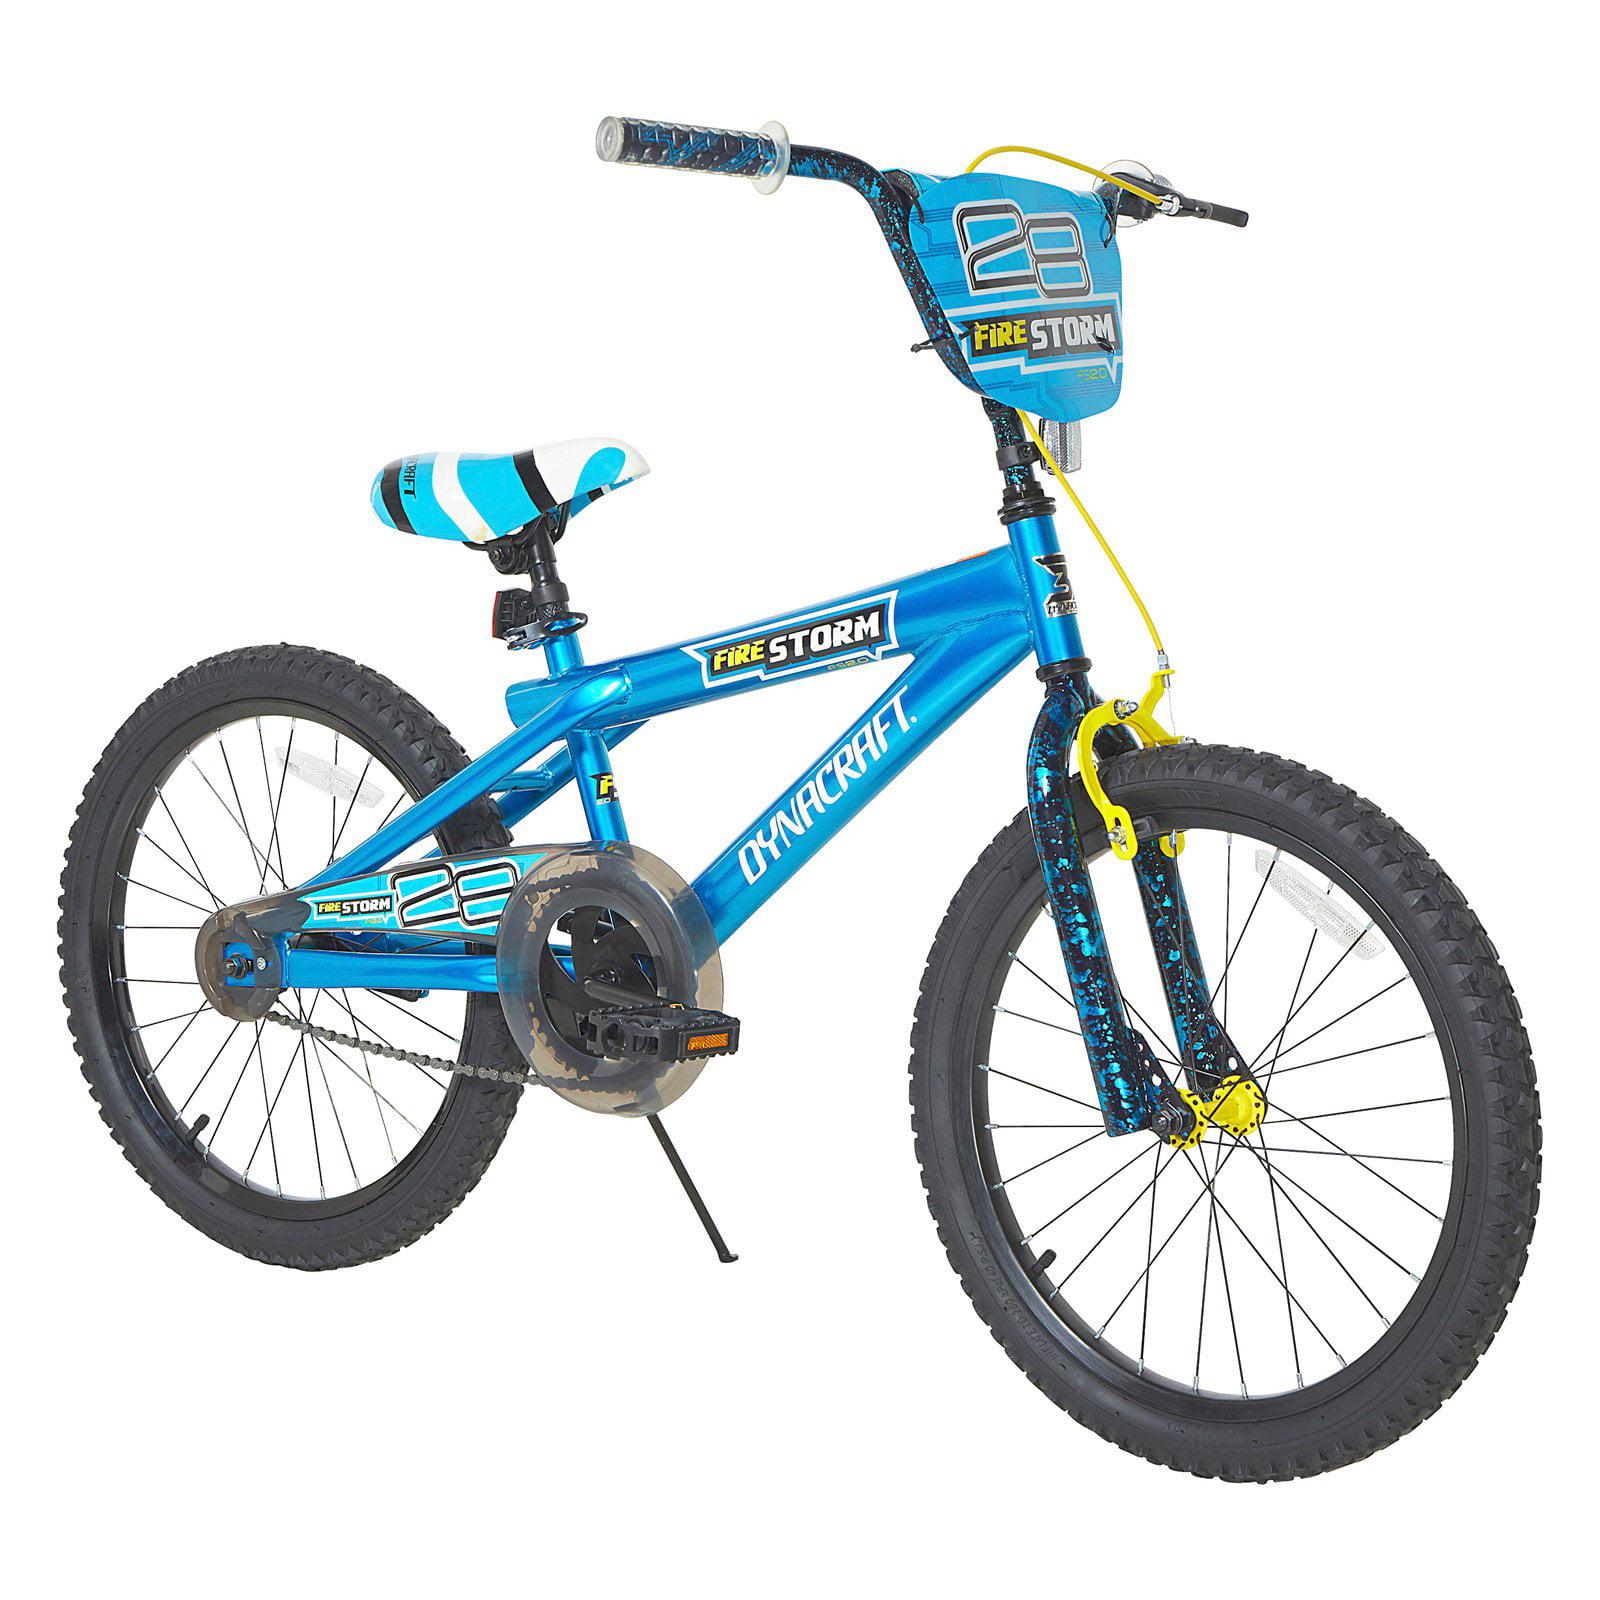 "Dynacraft 20"" Boys' Firestorm Bike by Dynacraft BSC"